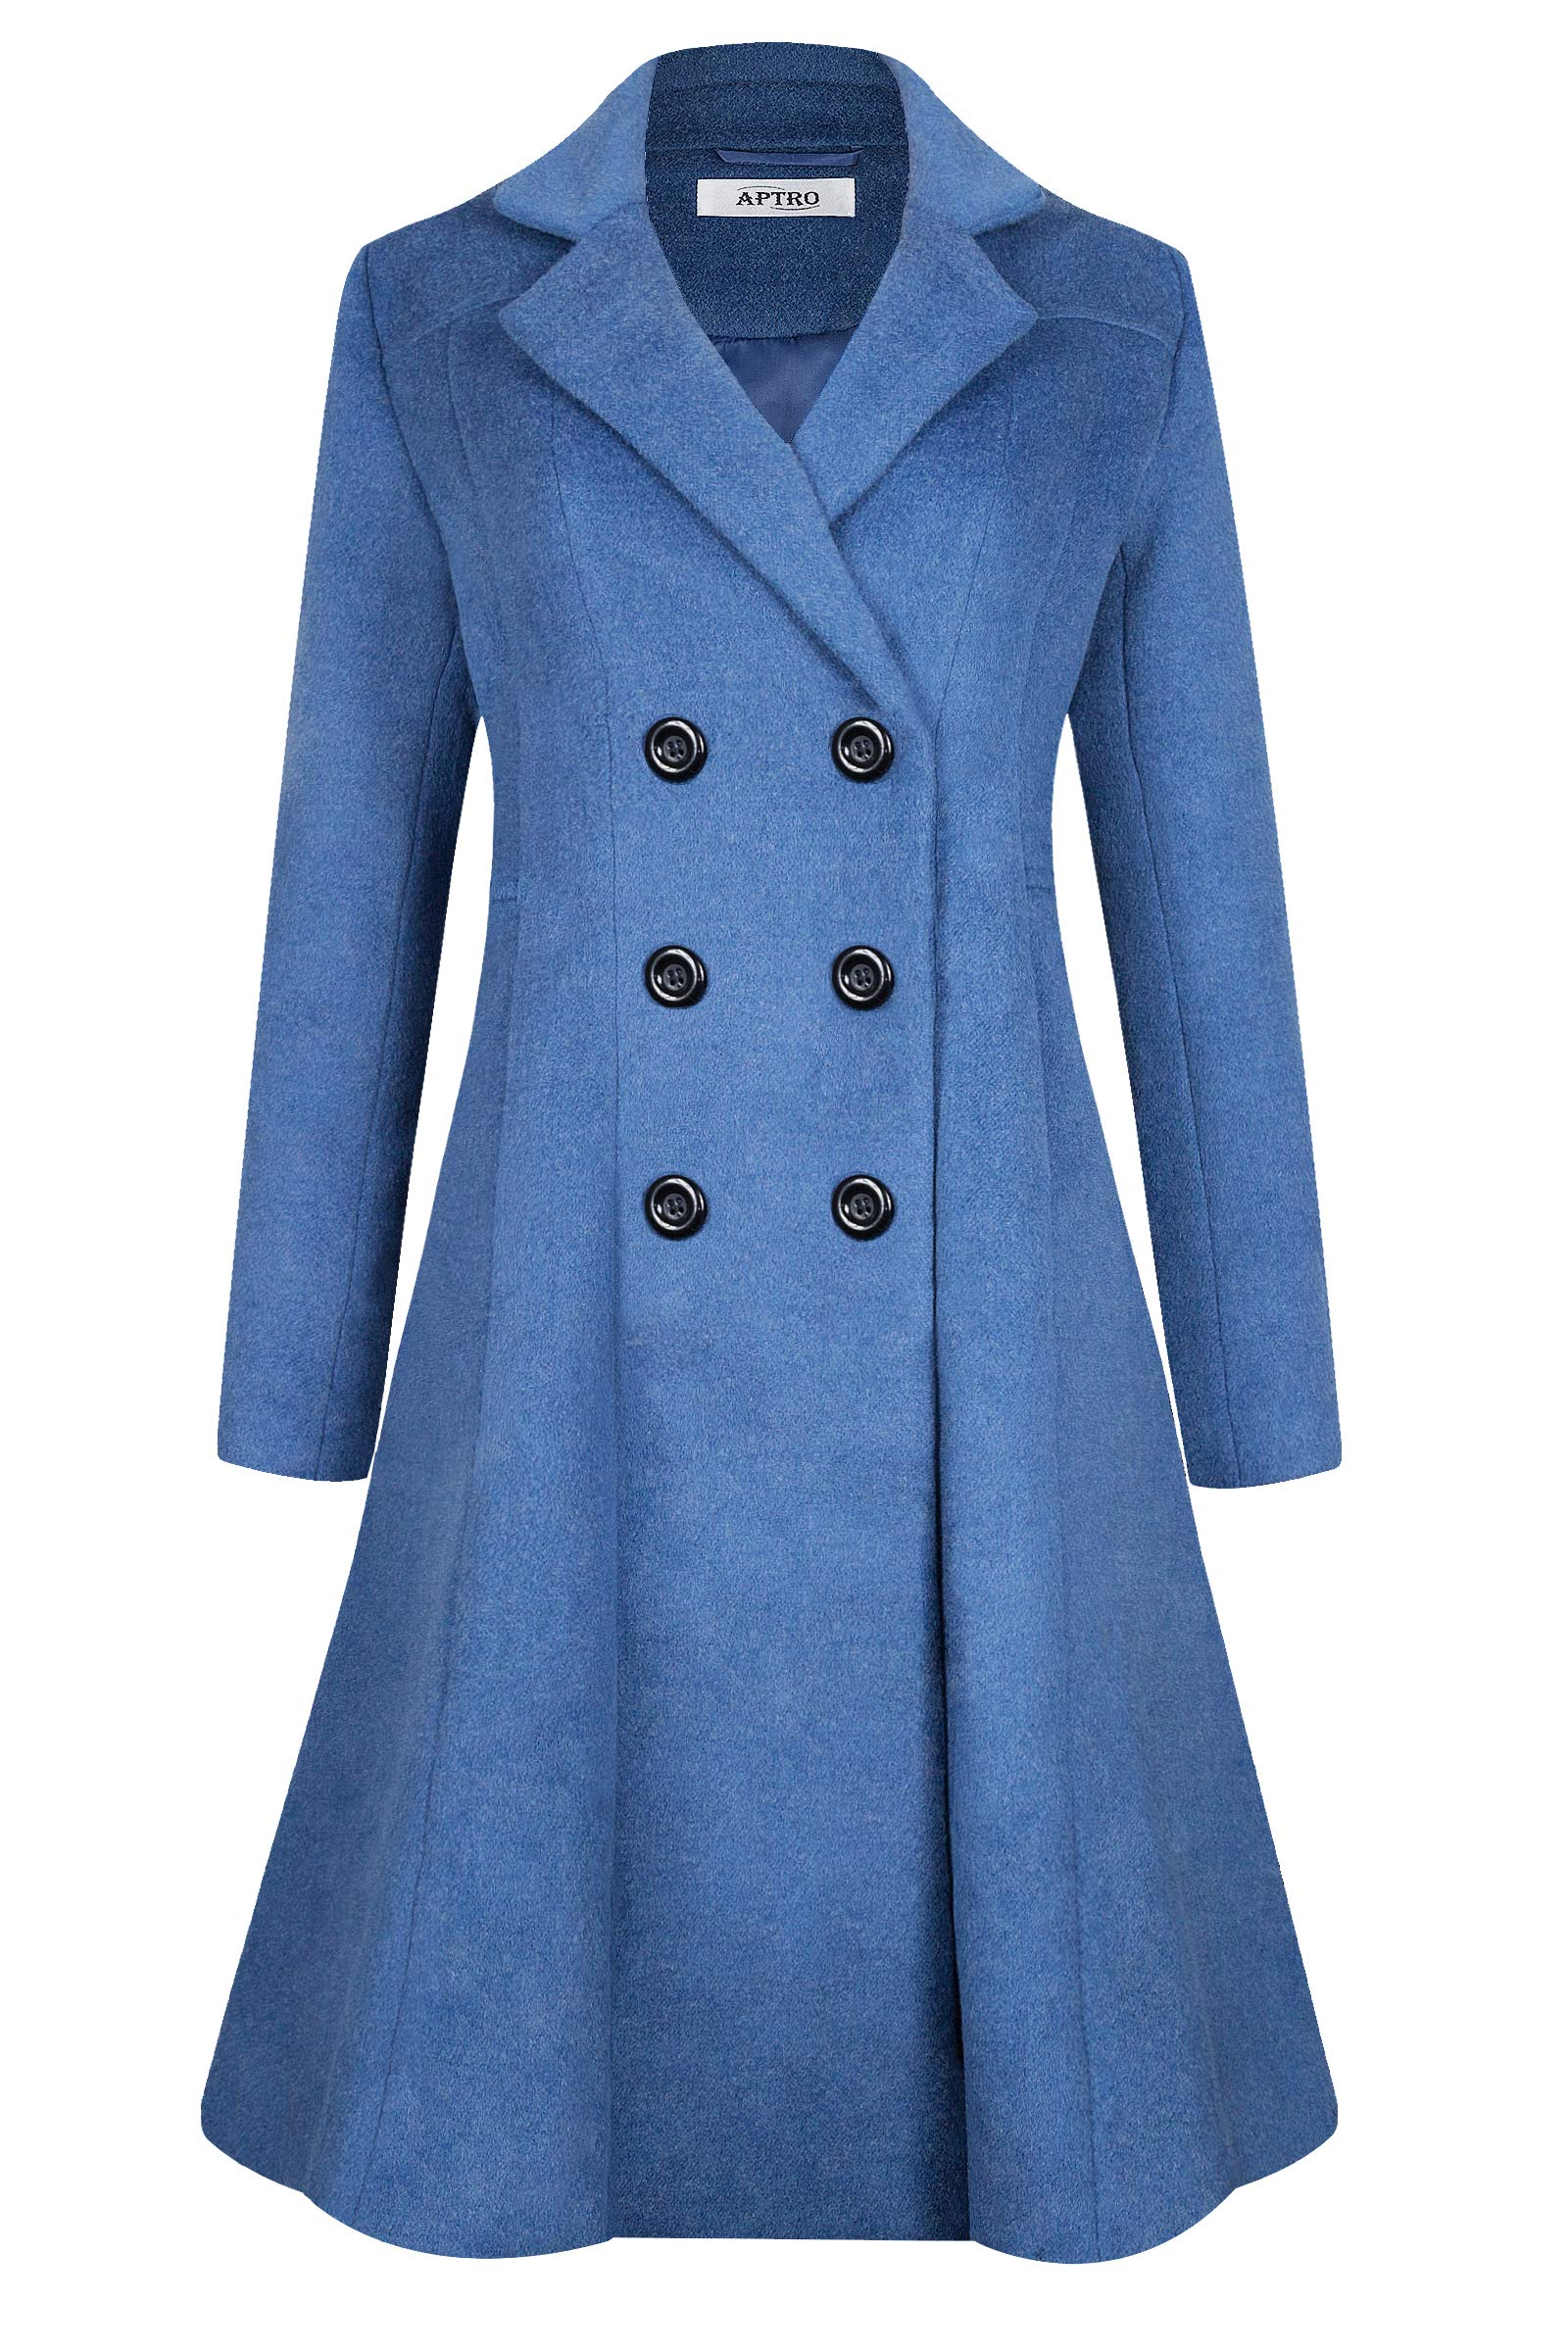 APTRO Women's Winter Wool Dress Coat Long Double Breasted Trench Coat